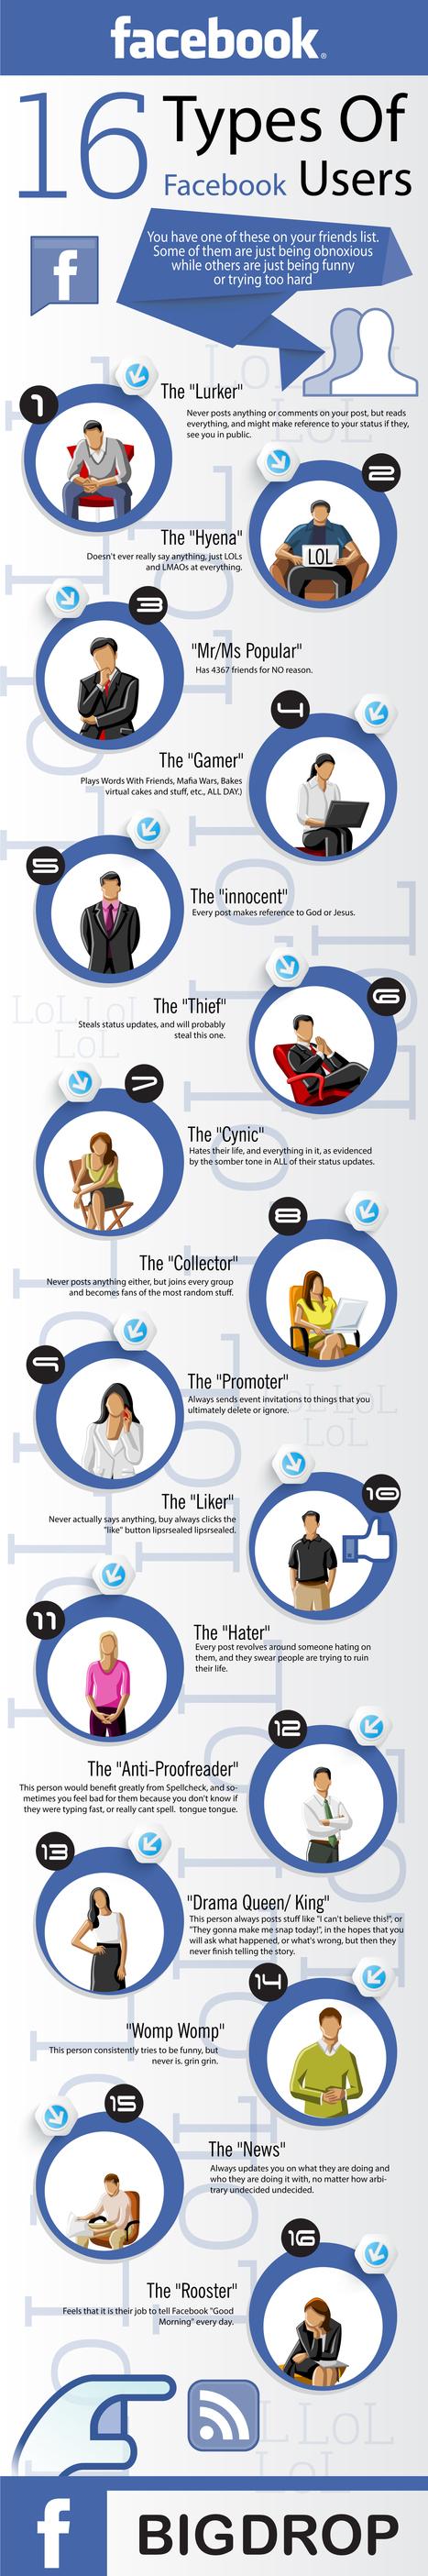 16 tipos de usuarios de FaceBook #infografia #infographic #socialmedia | juancarloscampos.net | Scoop.it